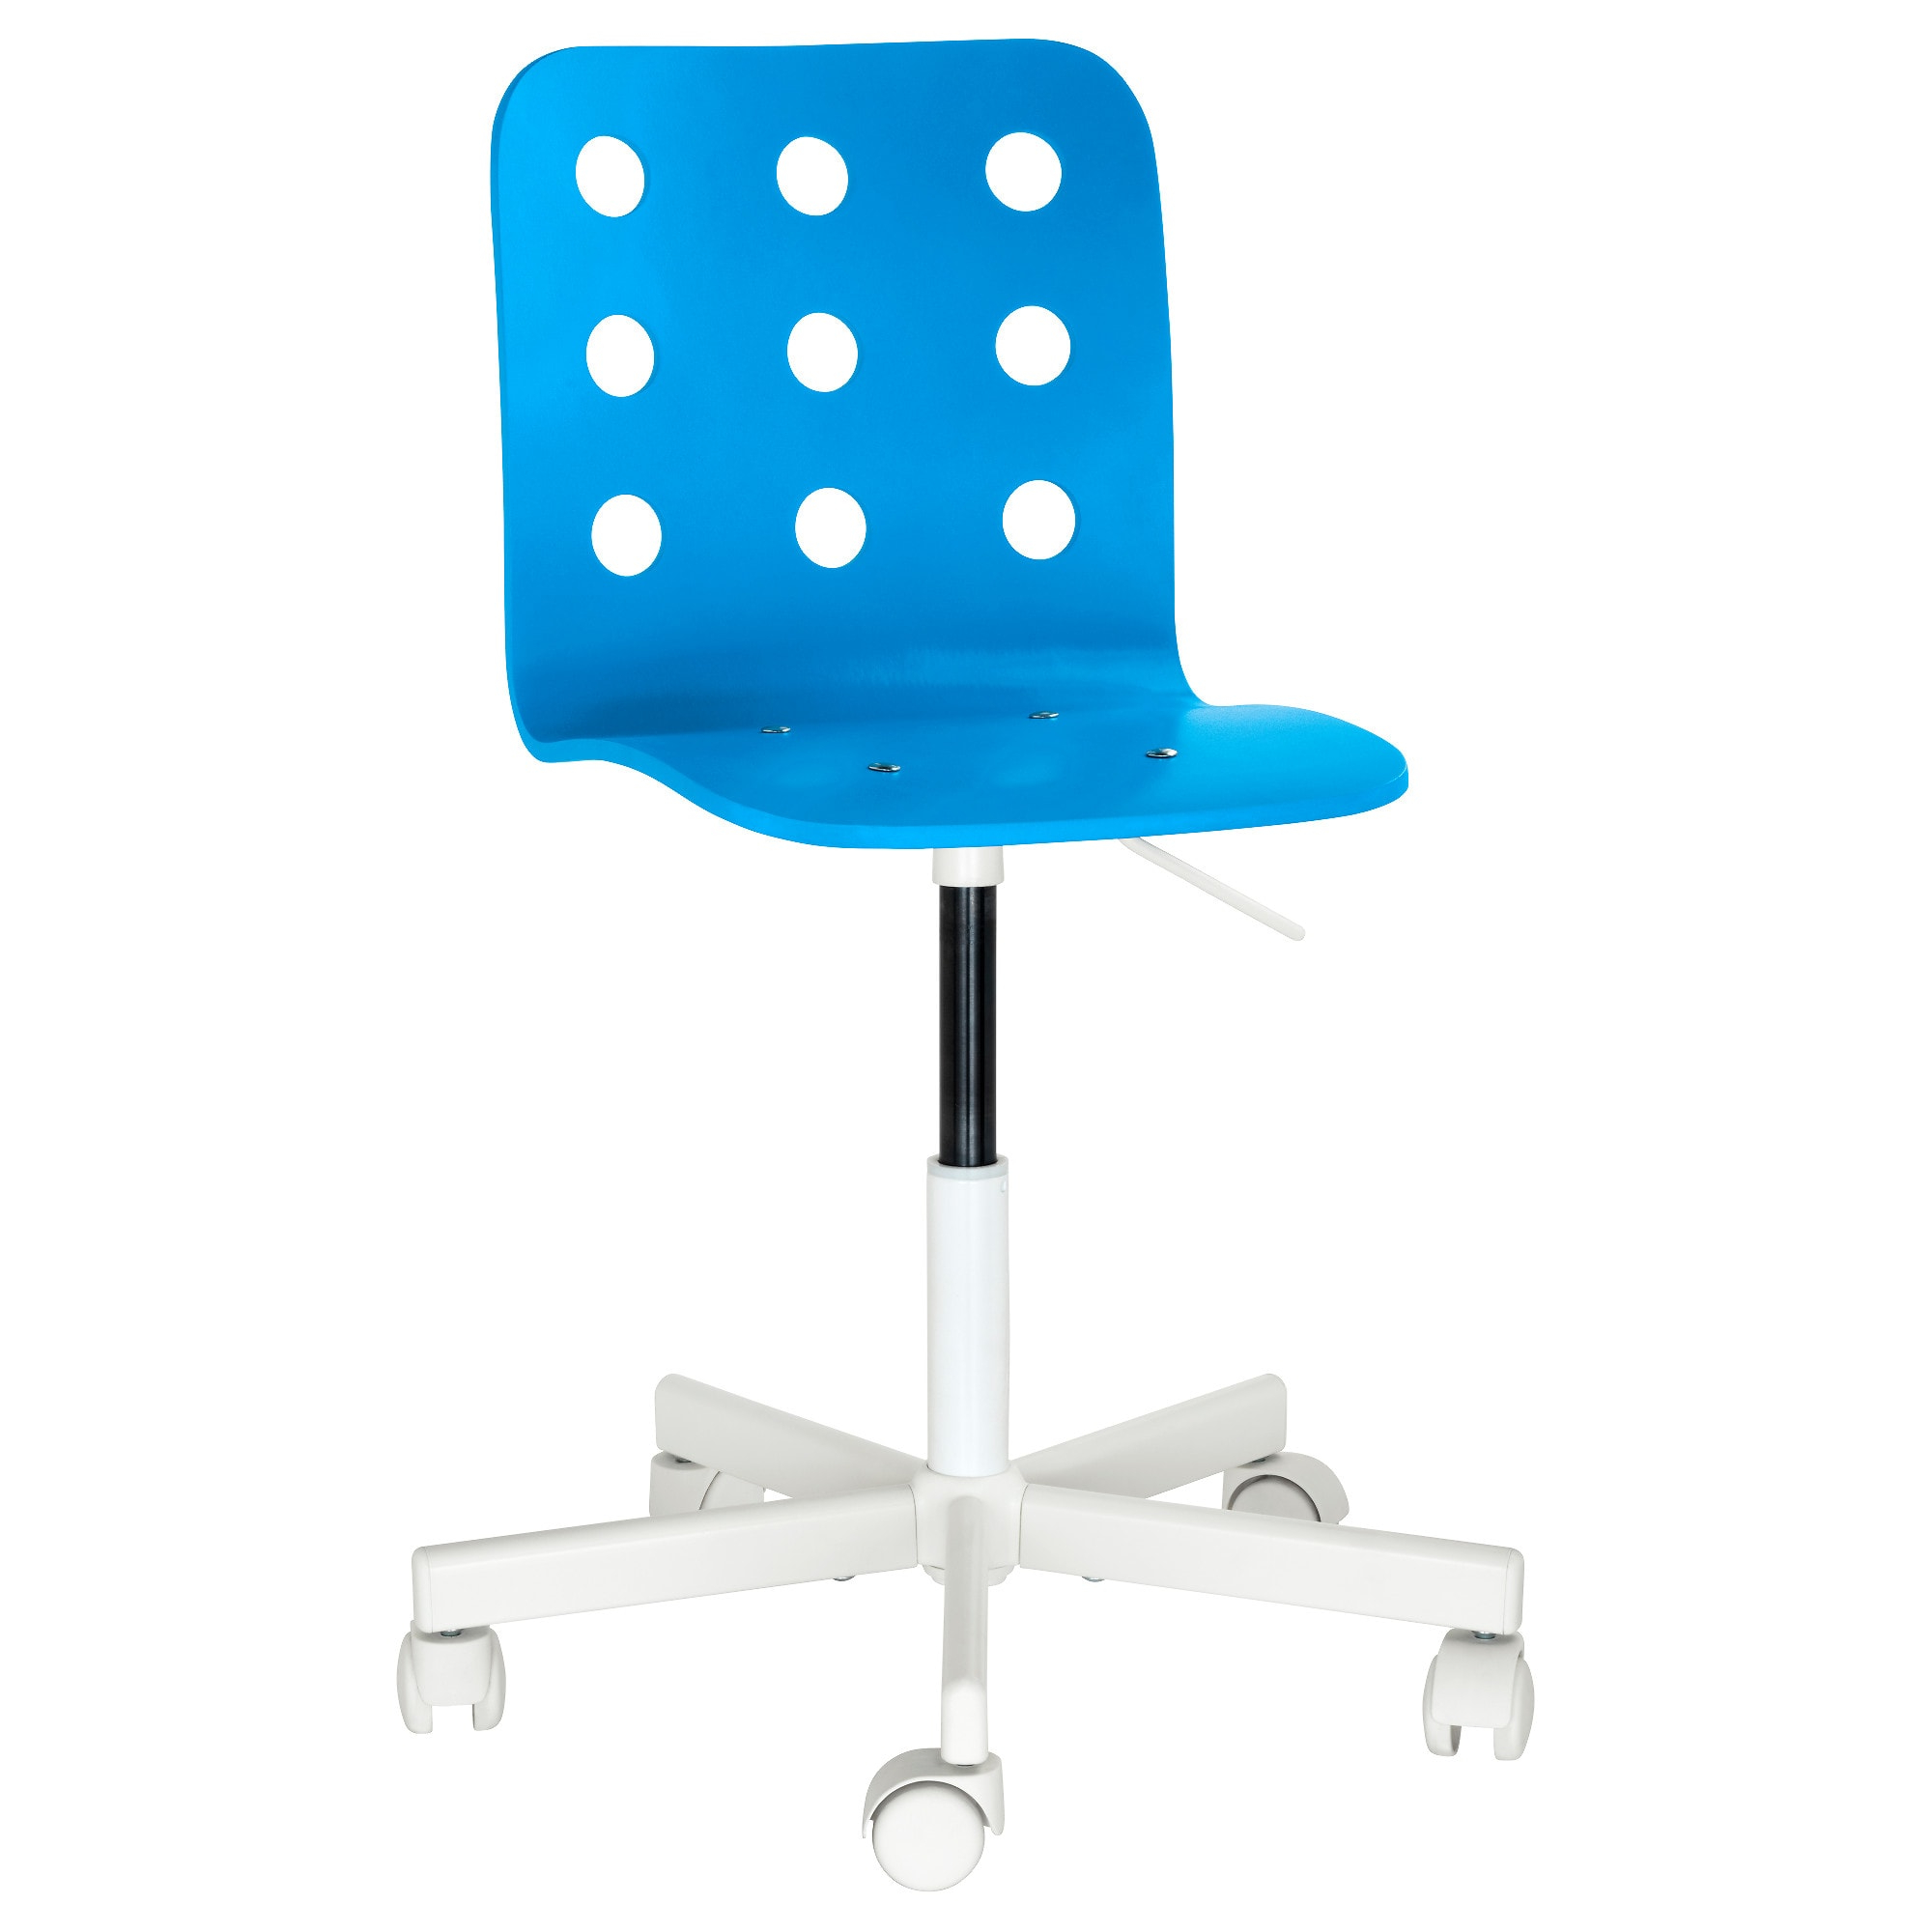 Silla Escritorio Juvenil Nkde Jules Silla Escritorio Nià O Azul Blanco Ikea